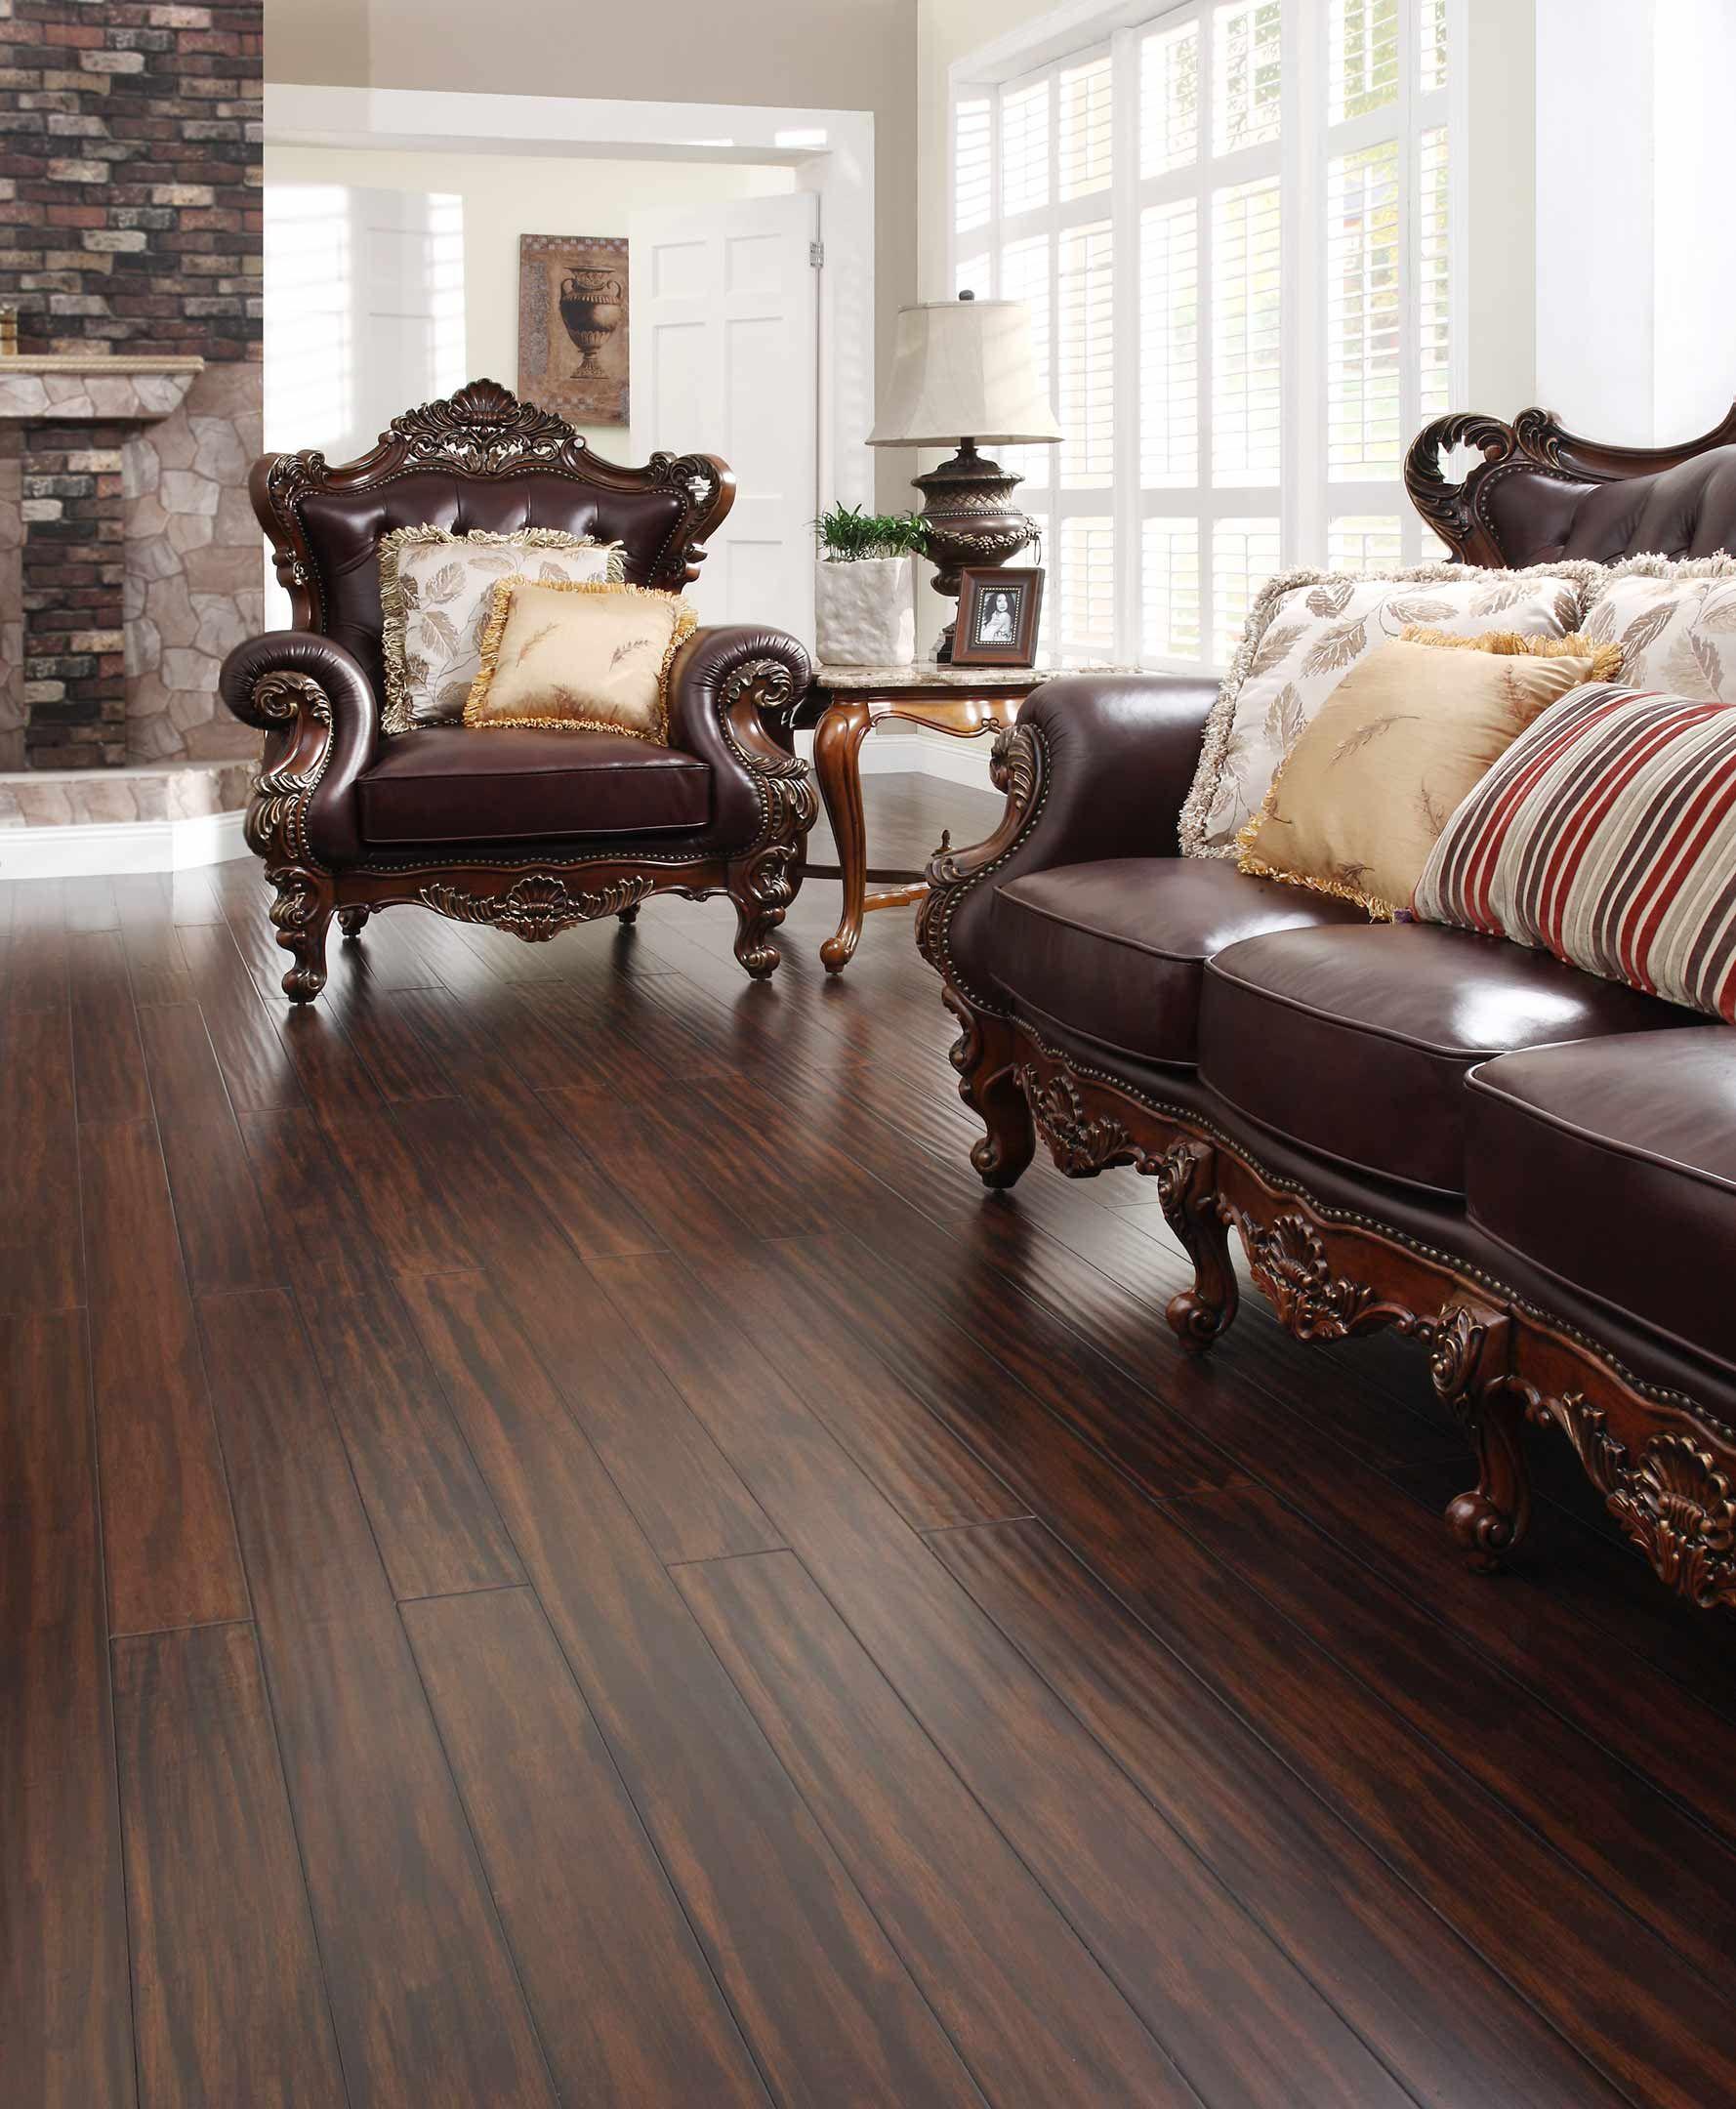 Flooring hardwood bamboo tile linoleum floor tile that for Dark wood linoleum flooring